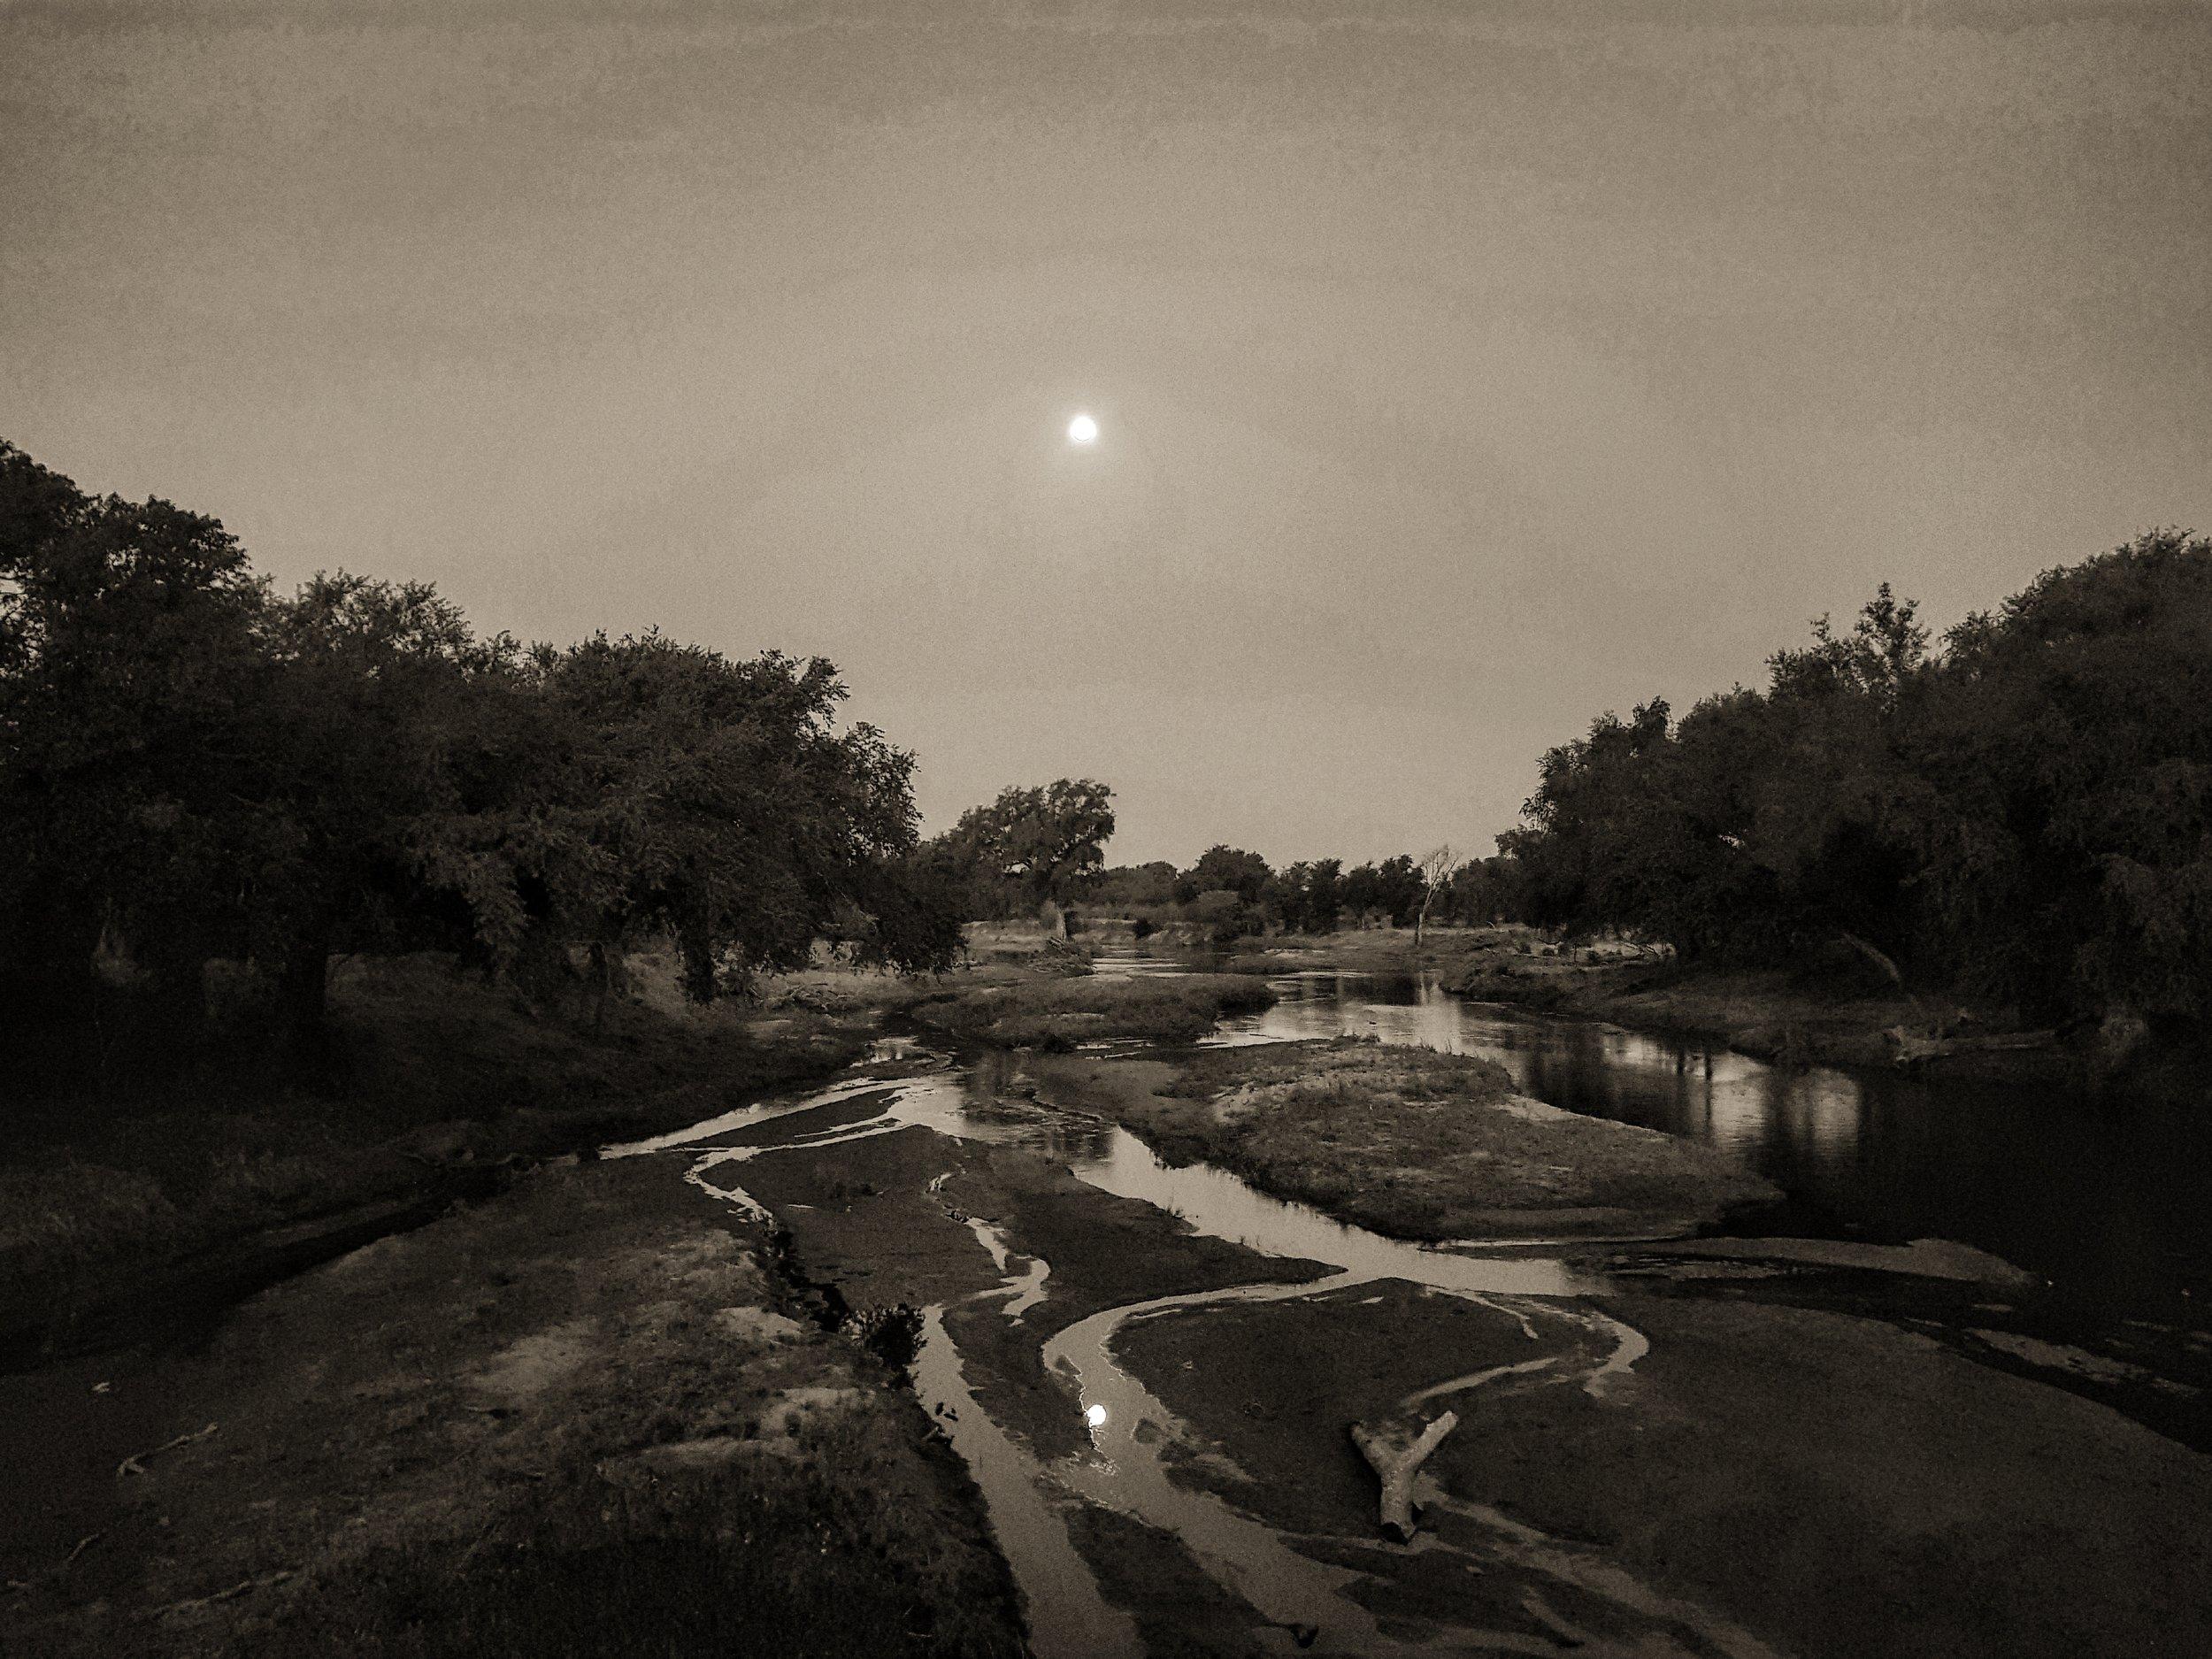 LUVUVHU RIVER DROUGHT: The Luvuvhu river at full moon.